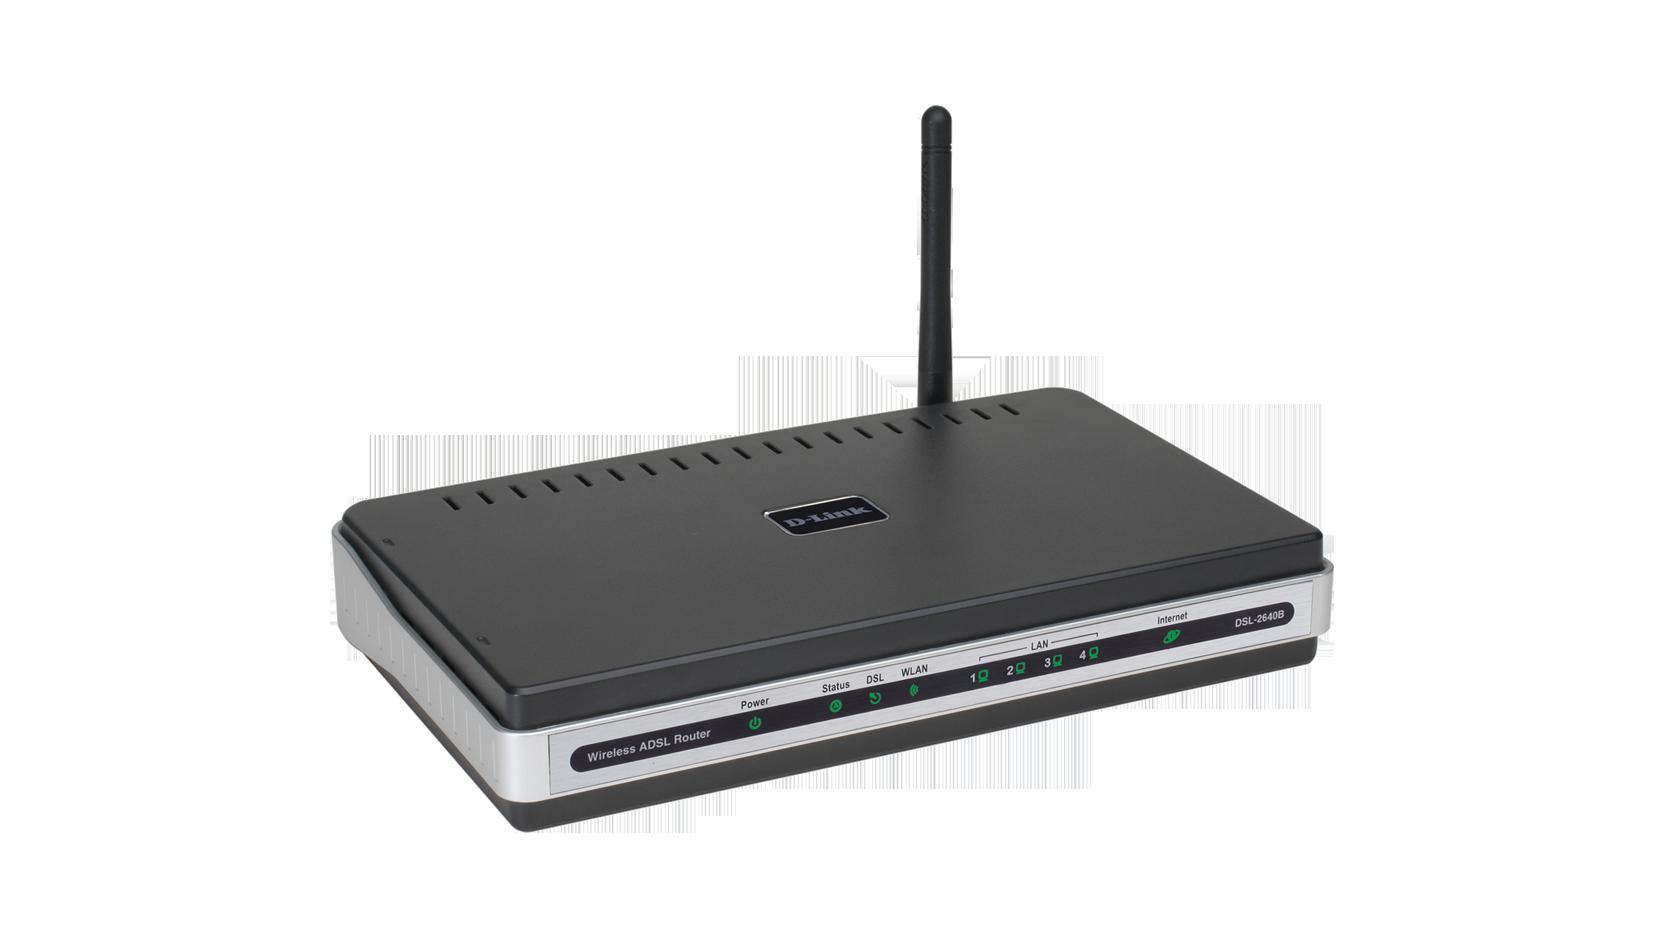 DSL 2641B Wireless G ADSL2 Modem Router